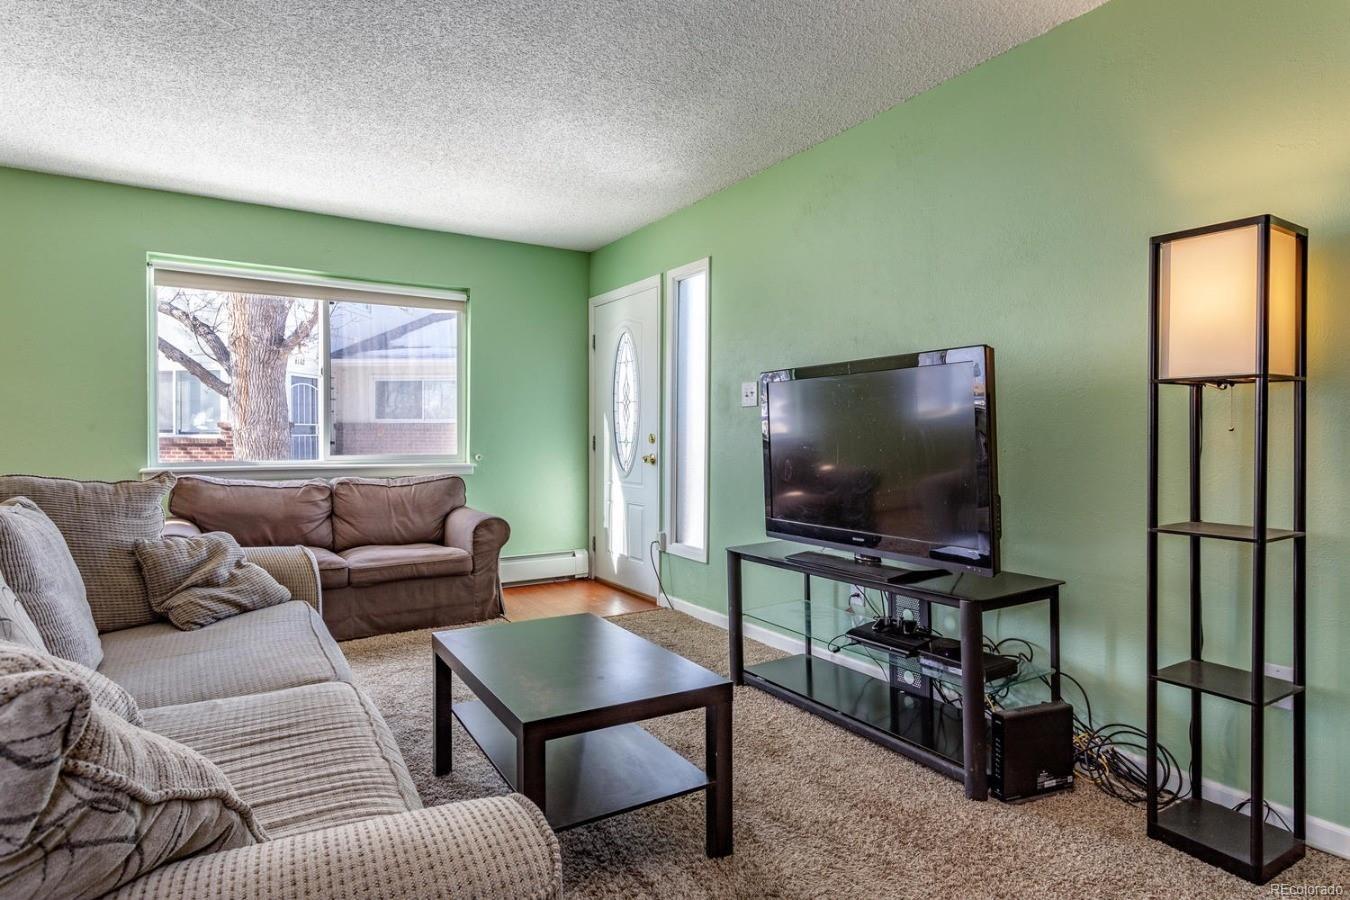 MLS# 8240620 - 5 - 7309 W Hampden Avenue #6203, Lakewood, CO 80227